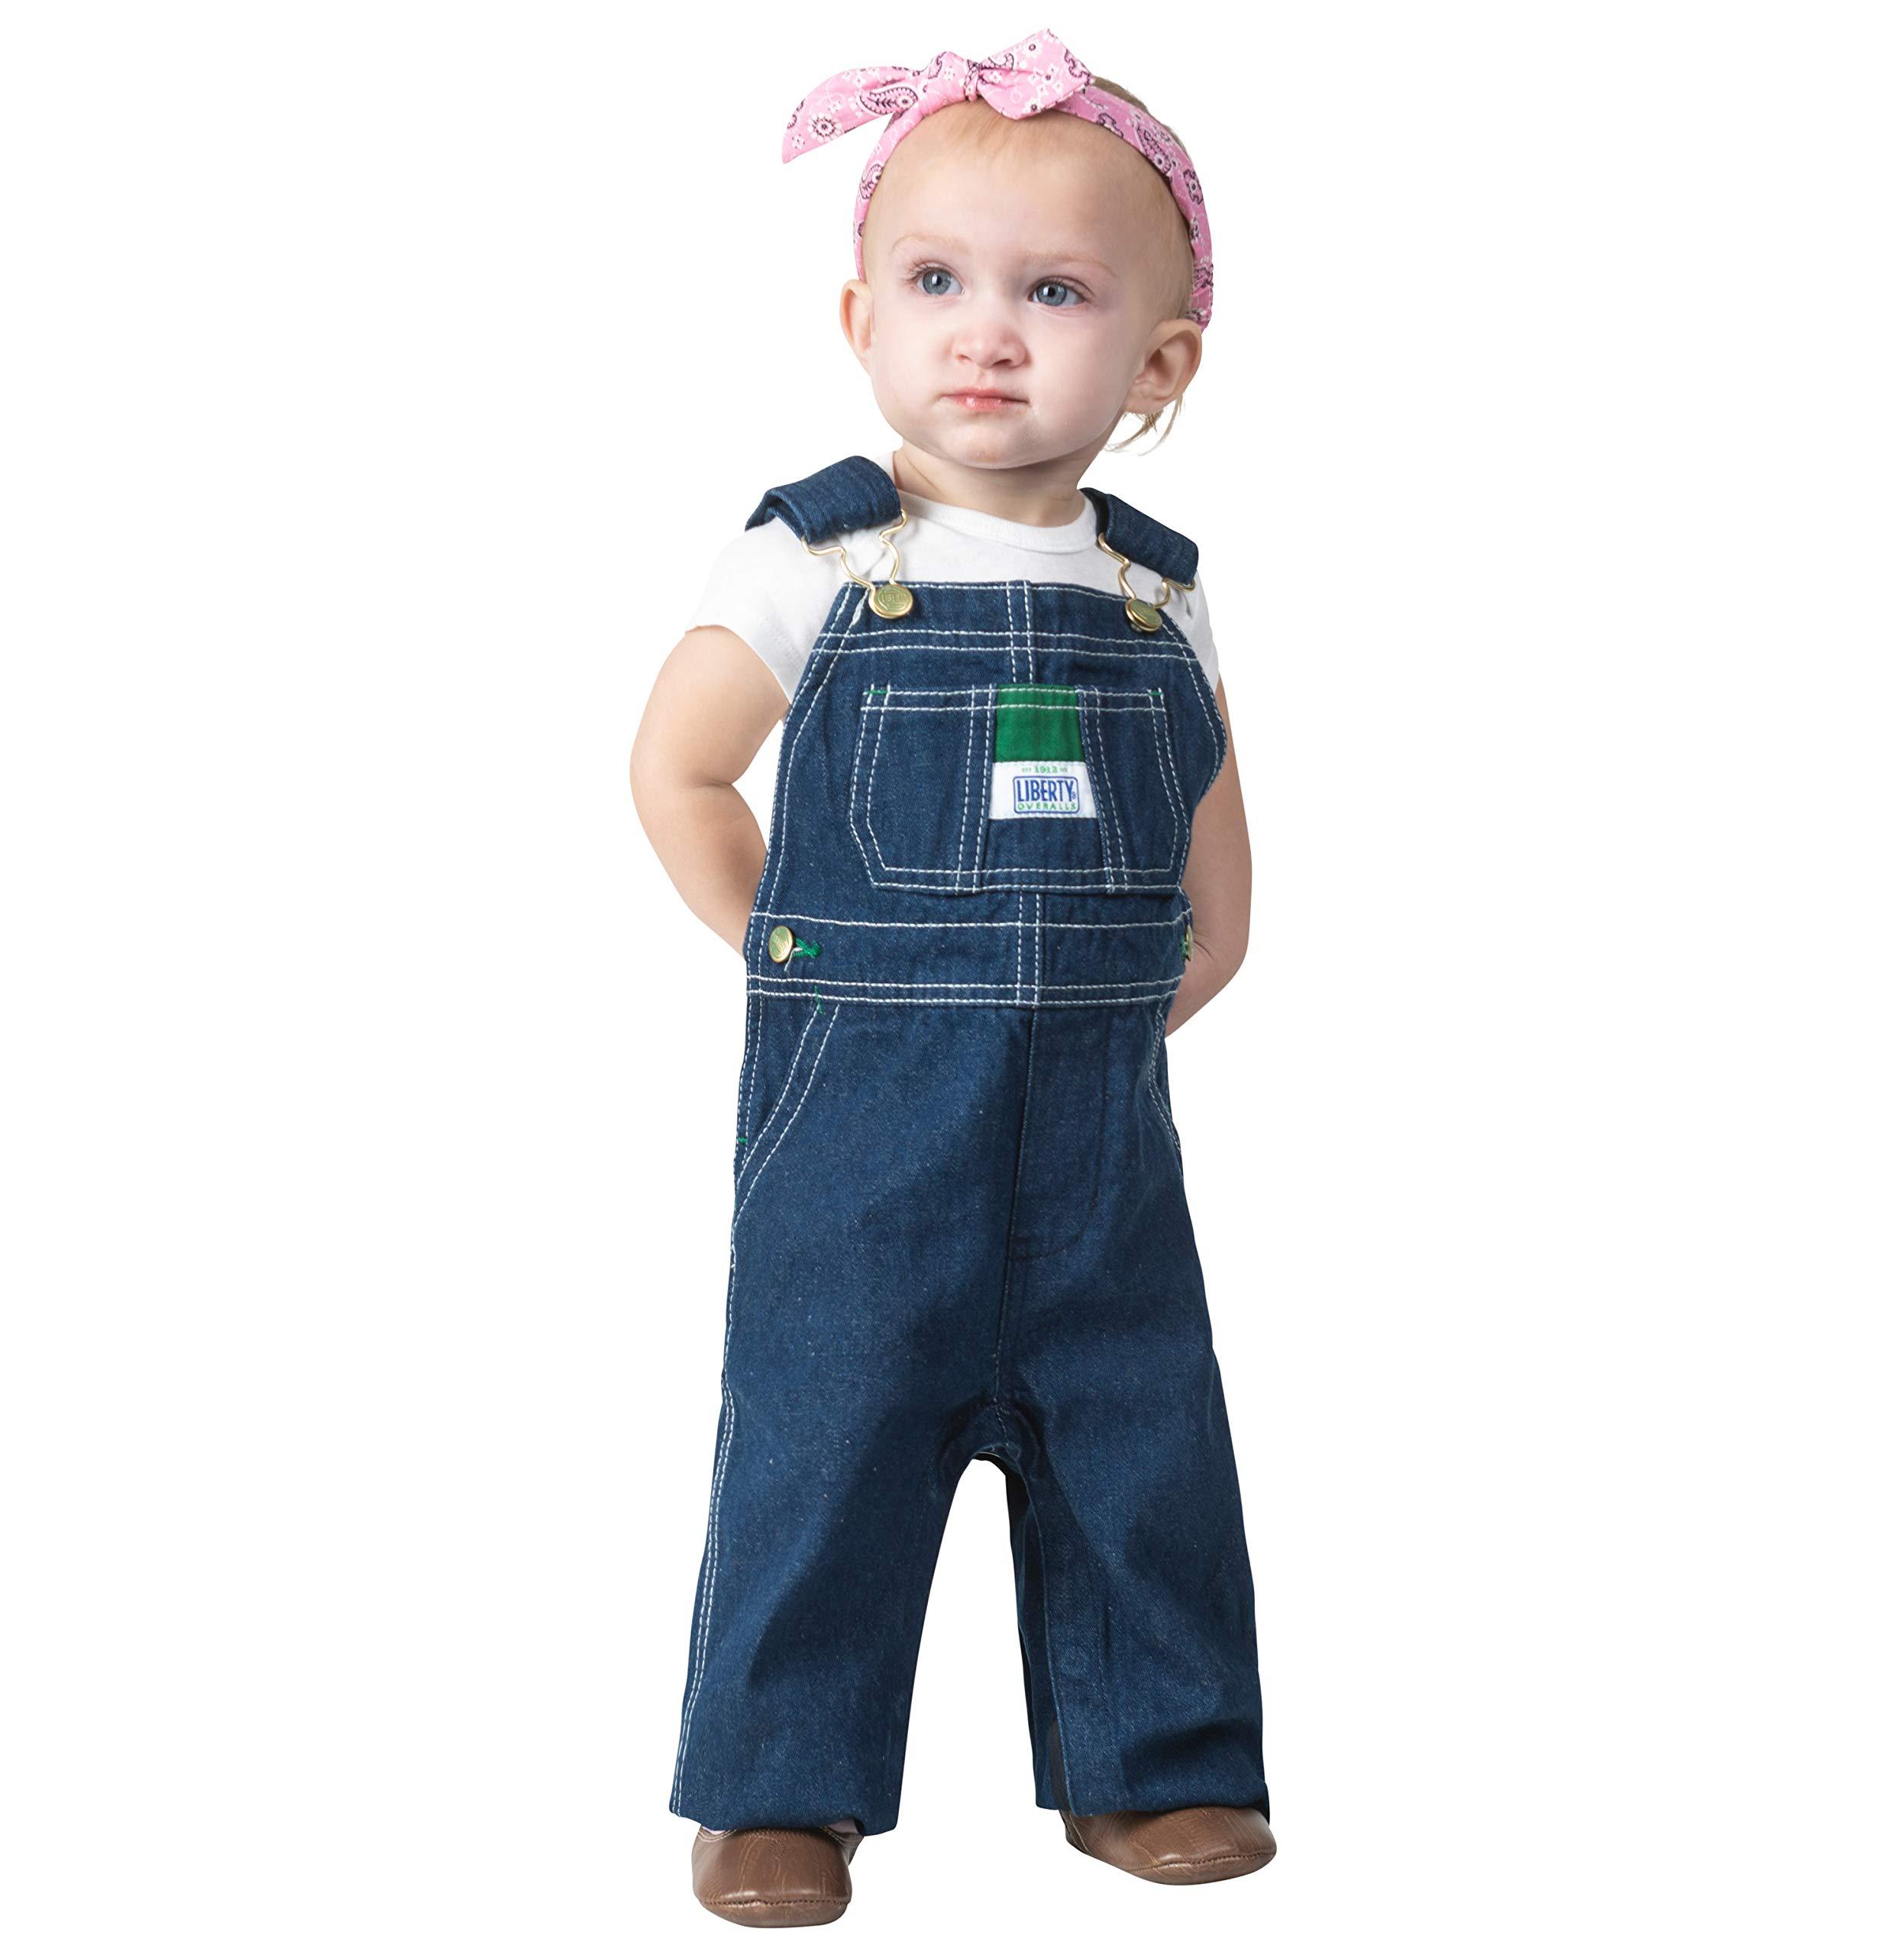 Liberty Kids' Toddler Denim Bib Overall, Rigid Blue, 18